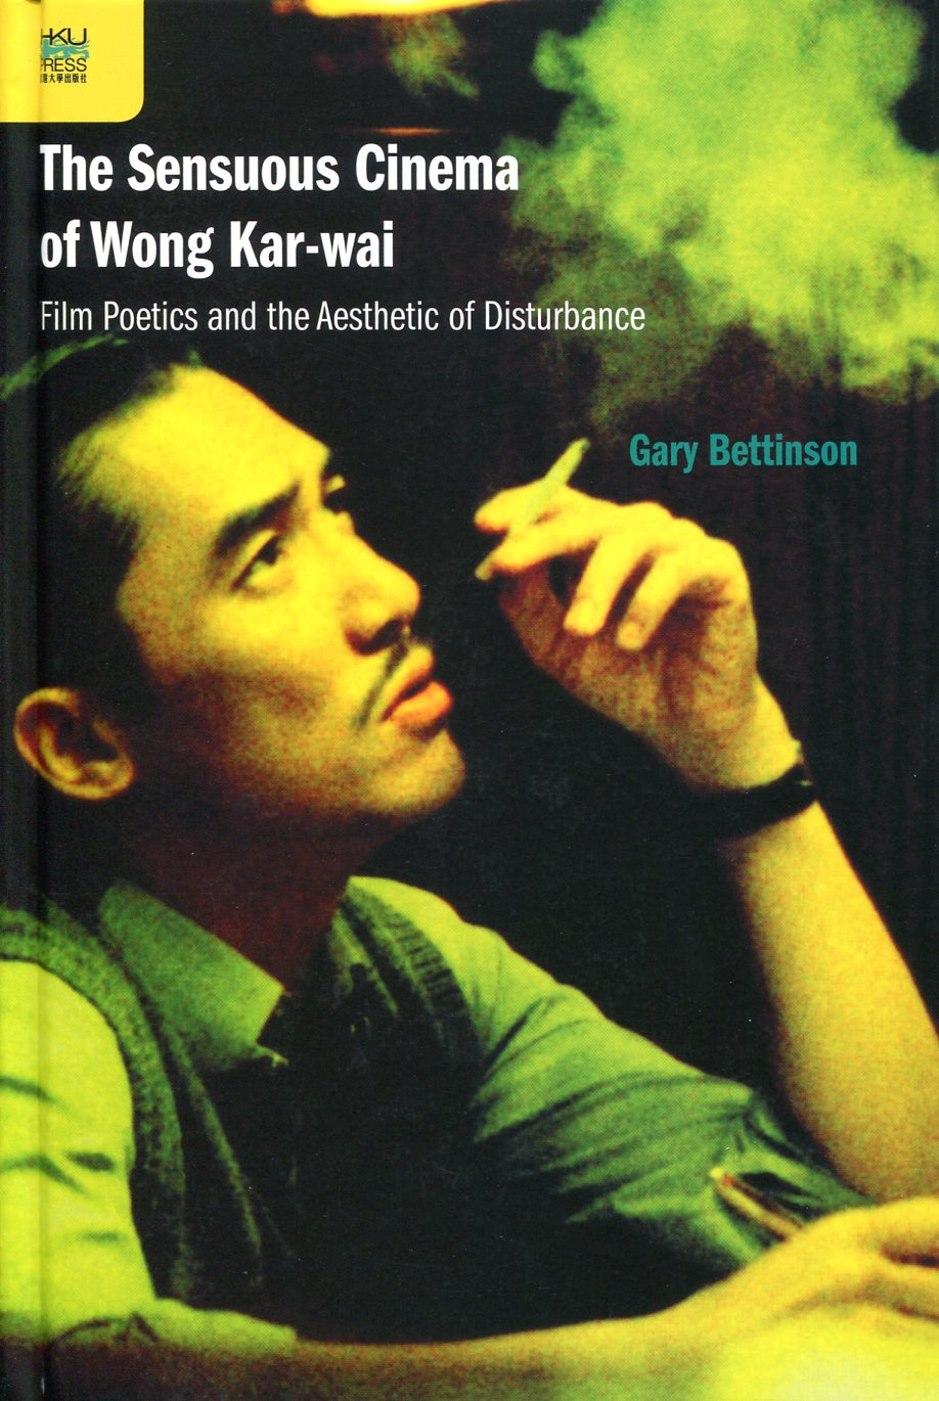 The Sensuous Cinema of Wong Kar~wai:Film Poet